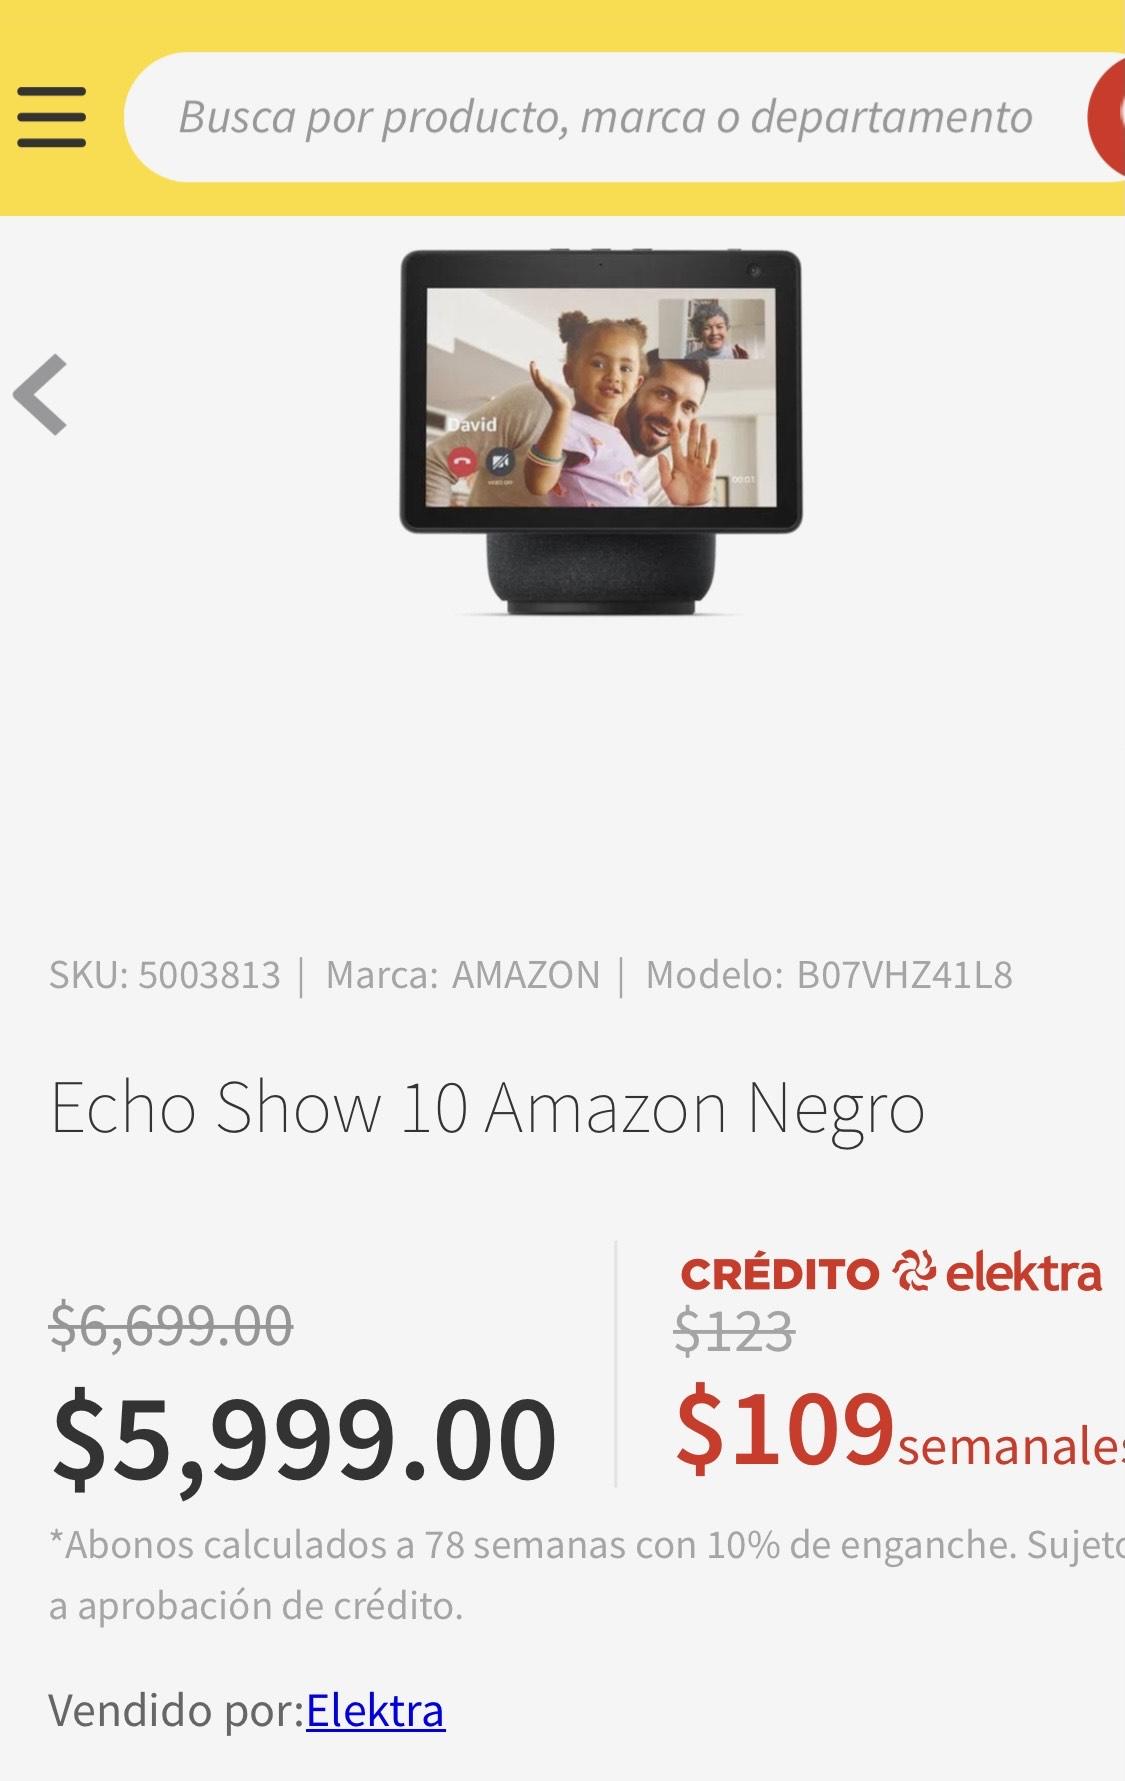 Elektra: Echo show 10 Negro